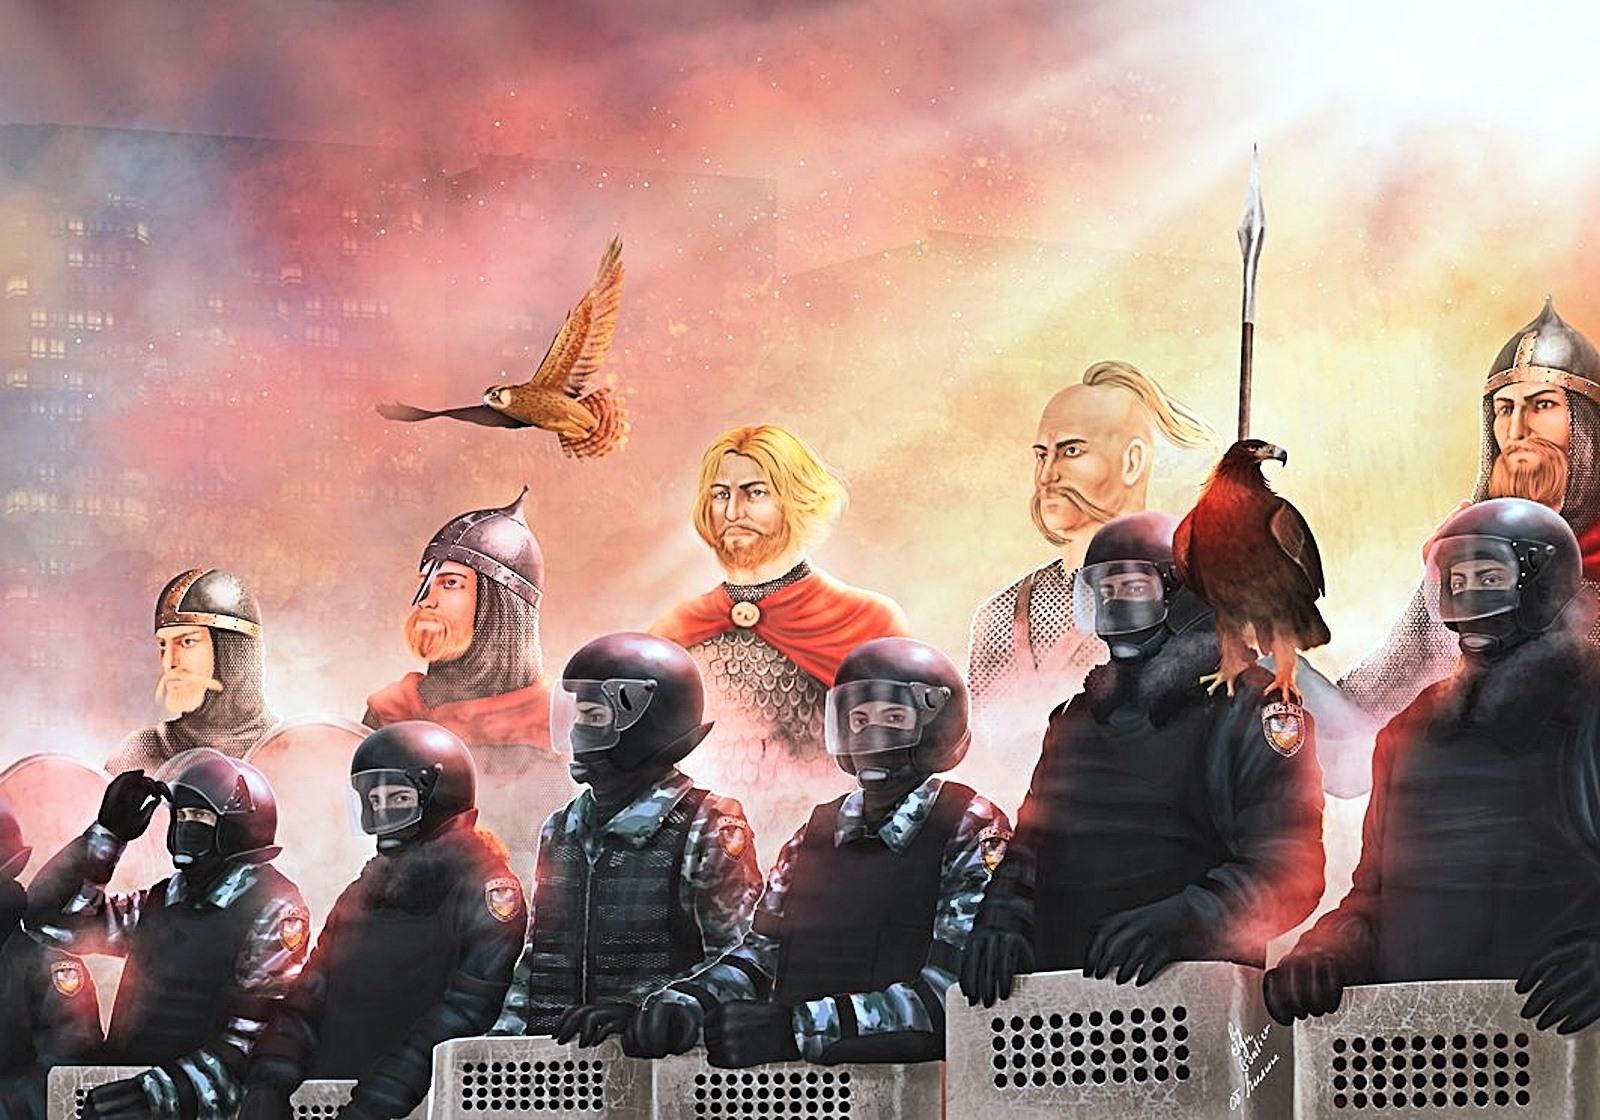 00 Berkut... Heroes of the Ukraine. 22.02.15